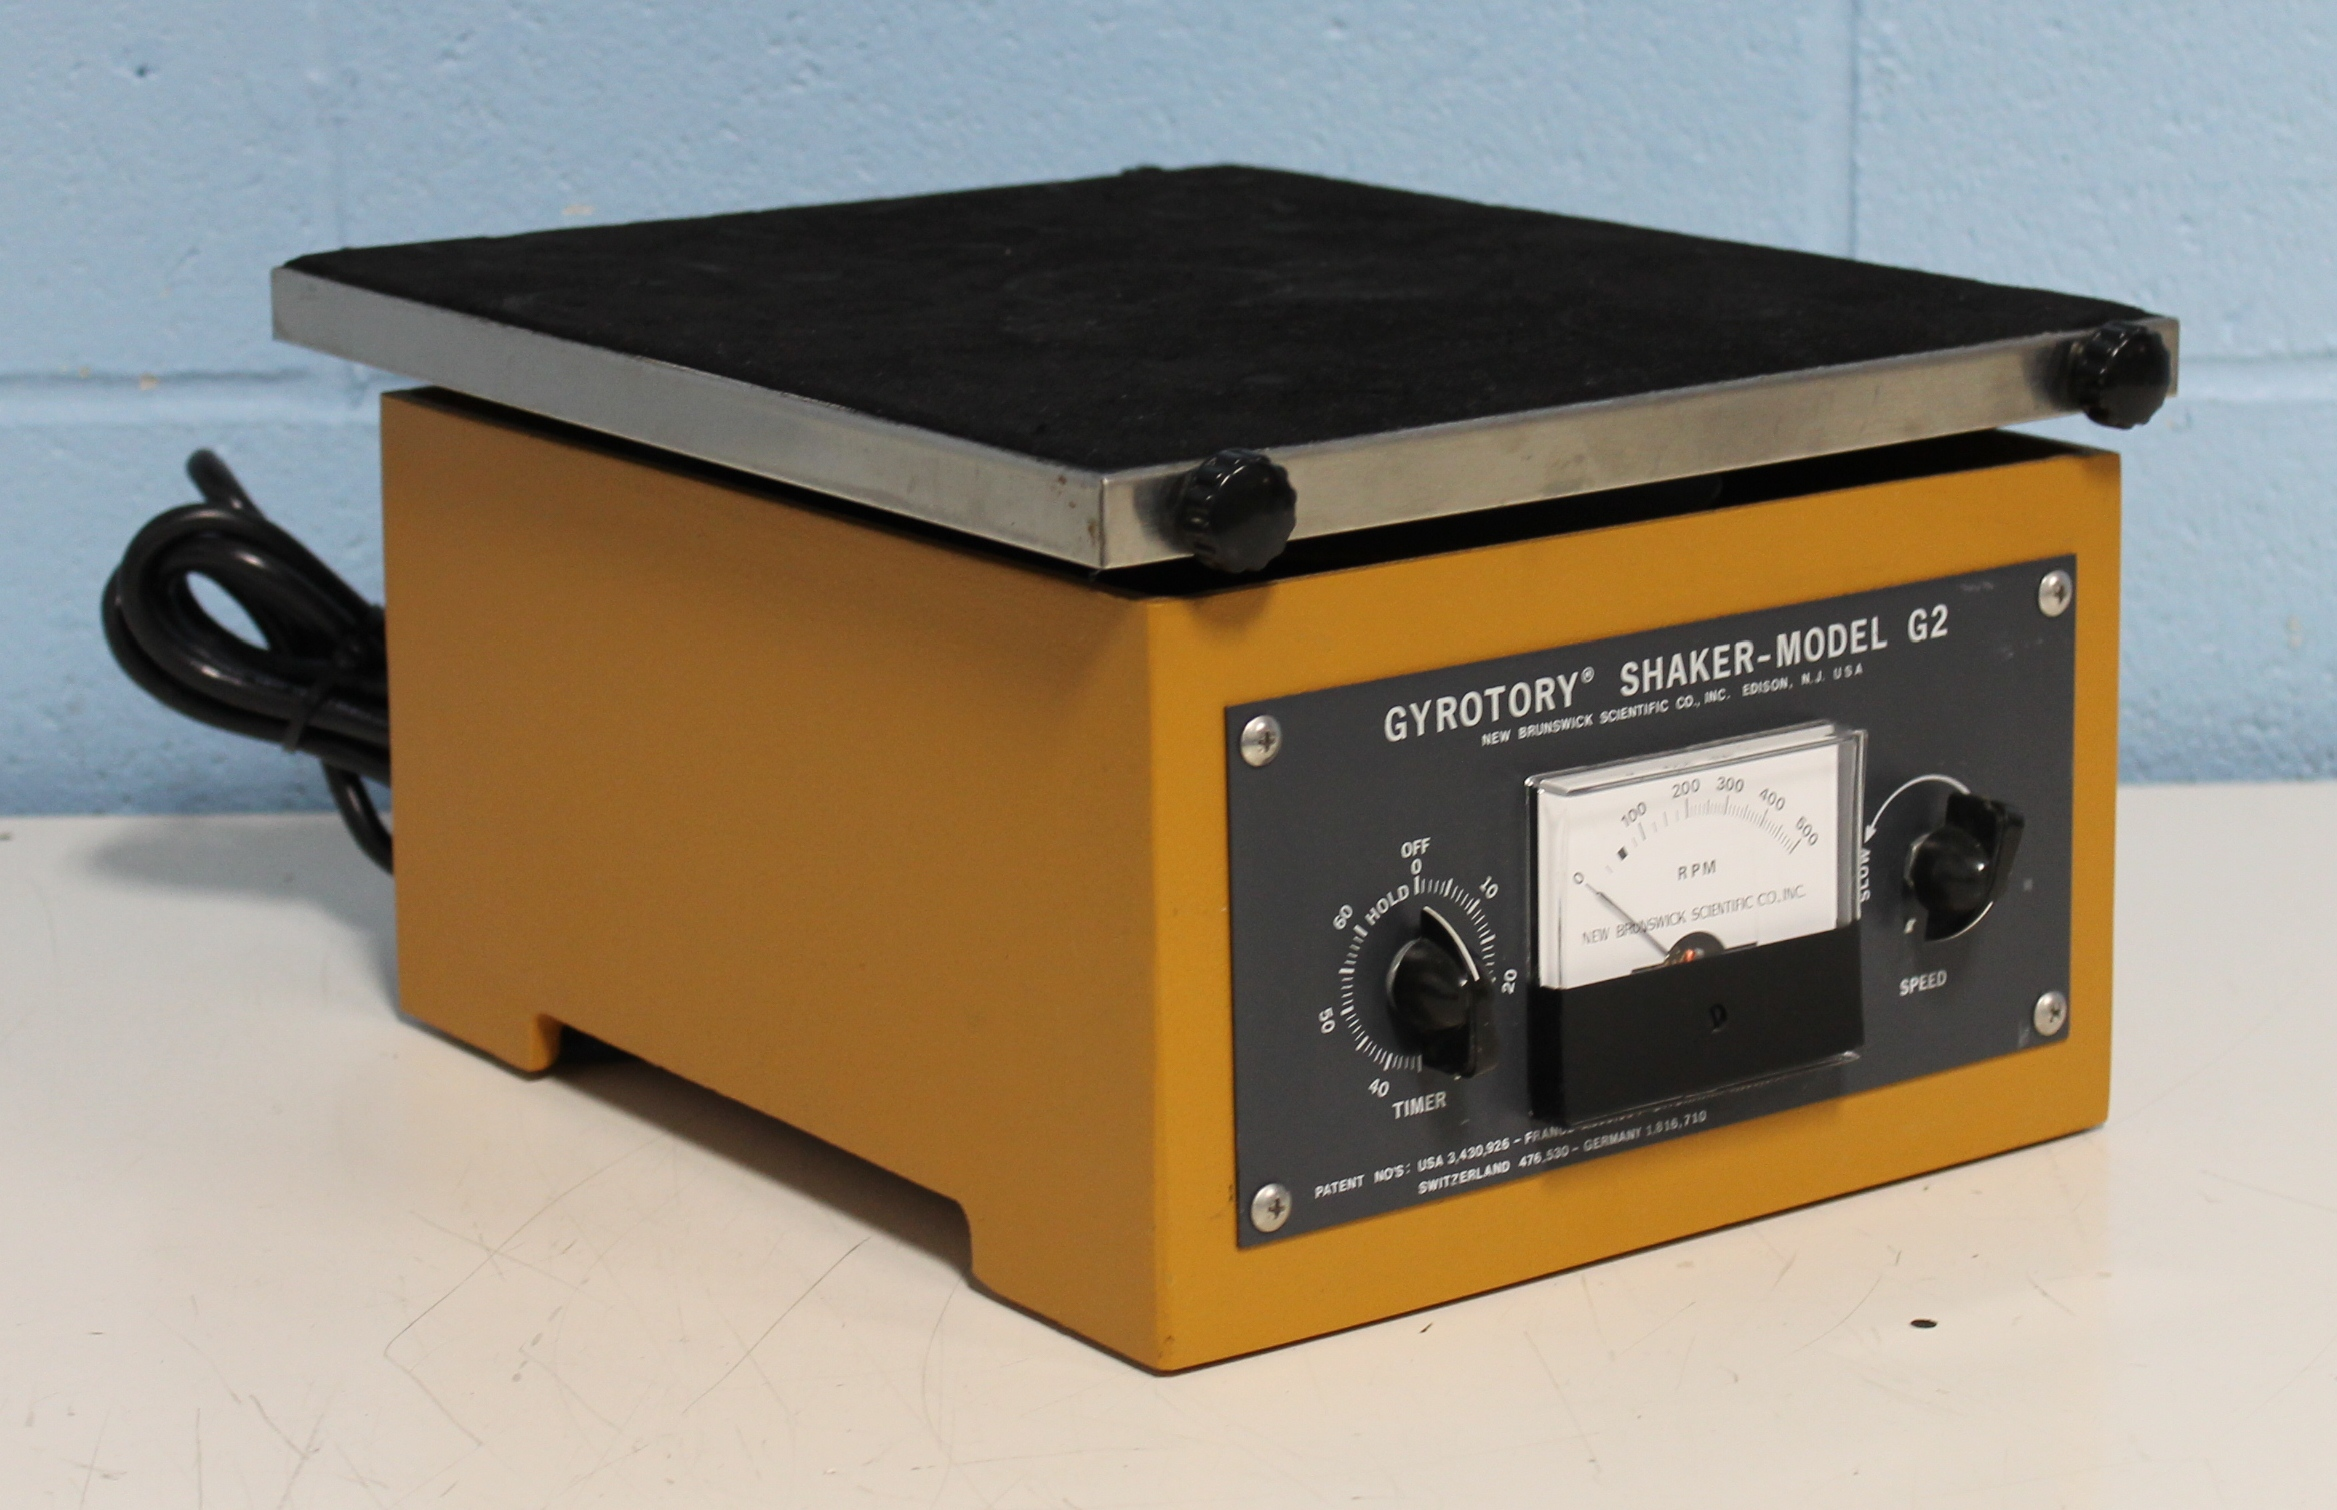 refurbished new brunswick scientific co gyrotory shaker On shaker mobel